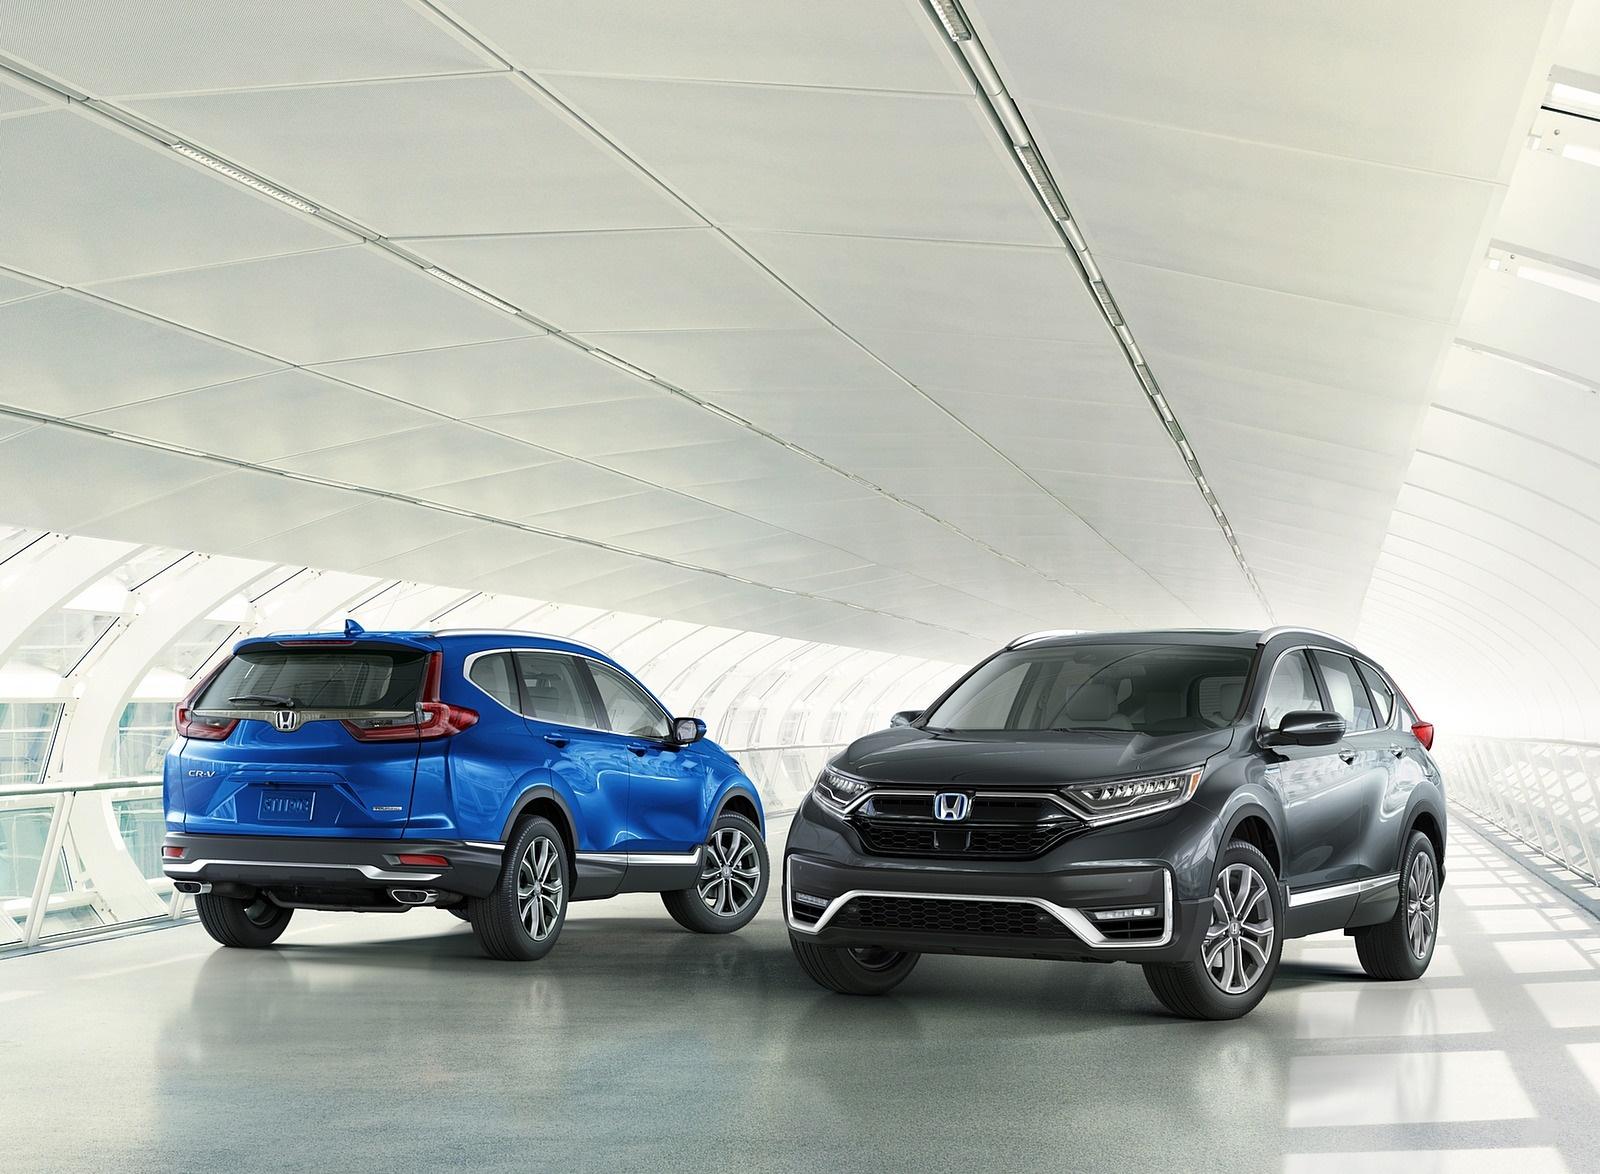 2020 Honda CR-V Wallpapers (1)